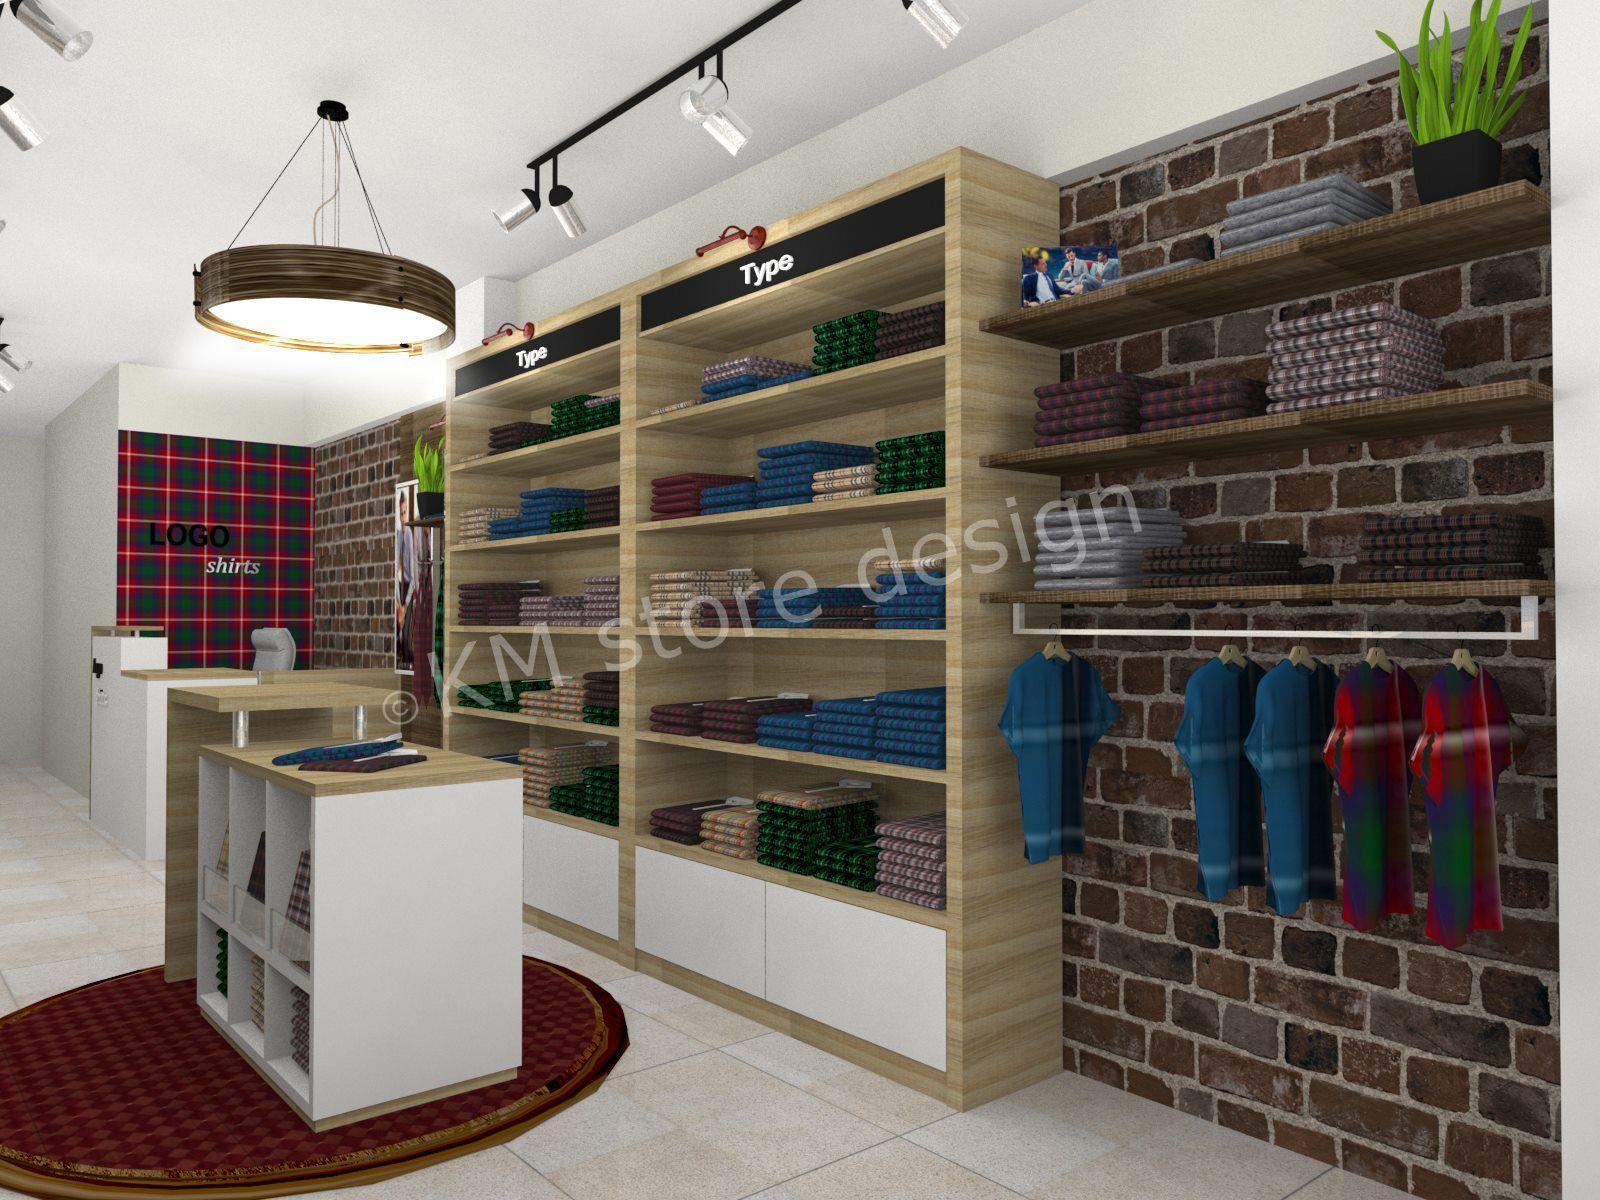 9392c6f4ac63 Η KM store design με την πολύχρονη πείρα της αναλαμβάνει το σχεδιασμό και  την επίπλωση κάθε